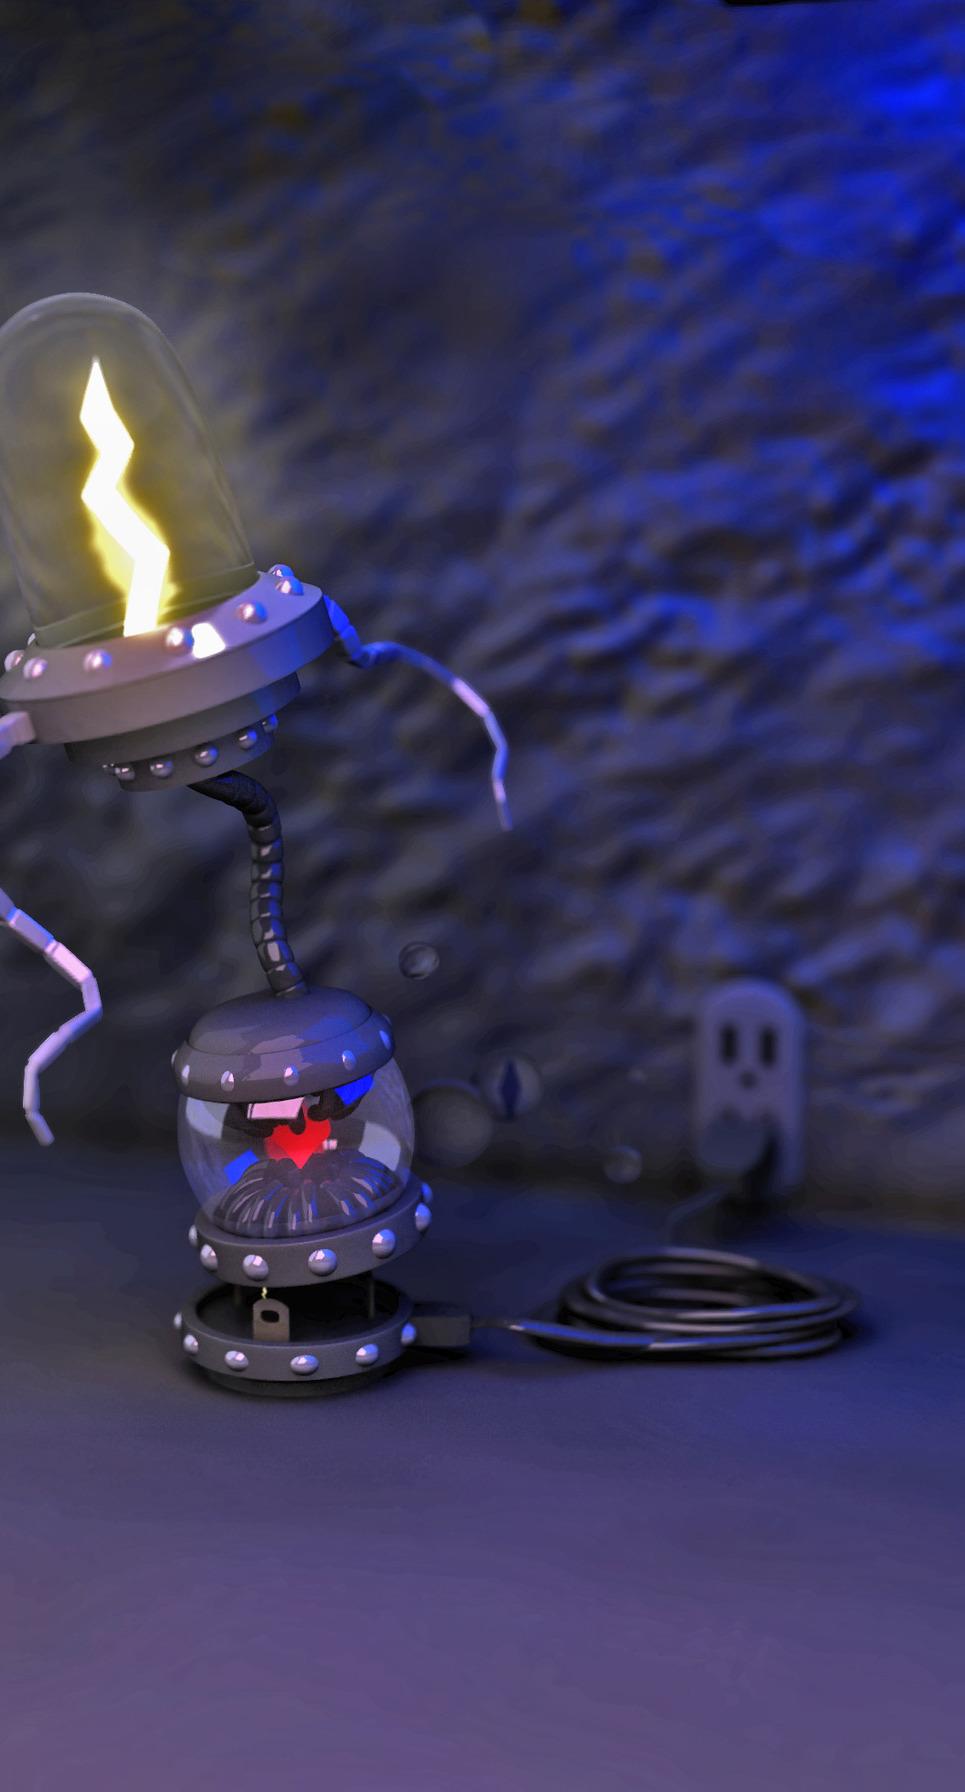 Robot copy show